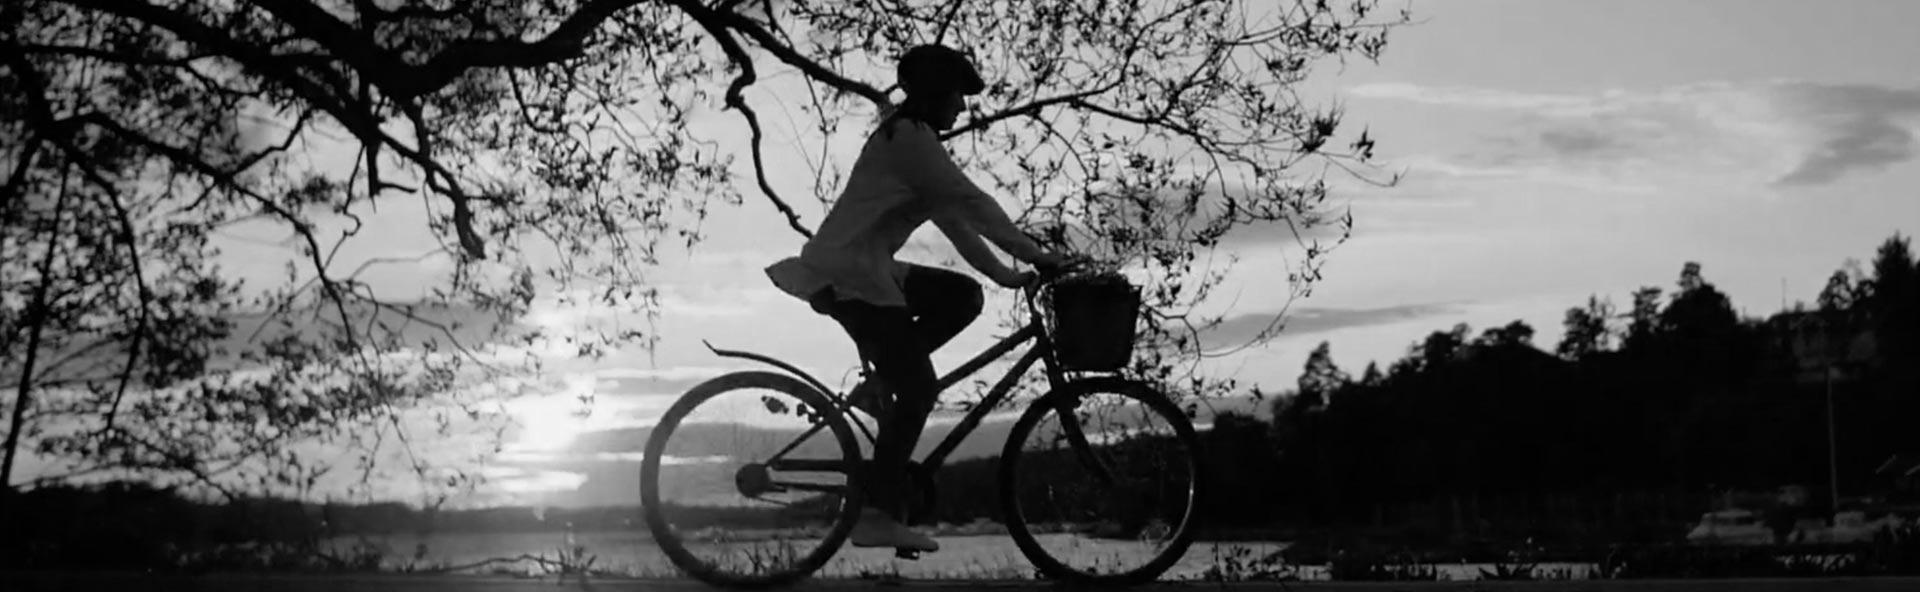 Bromma cykelservice video presentation